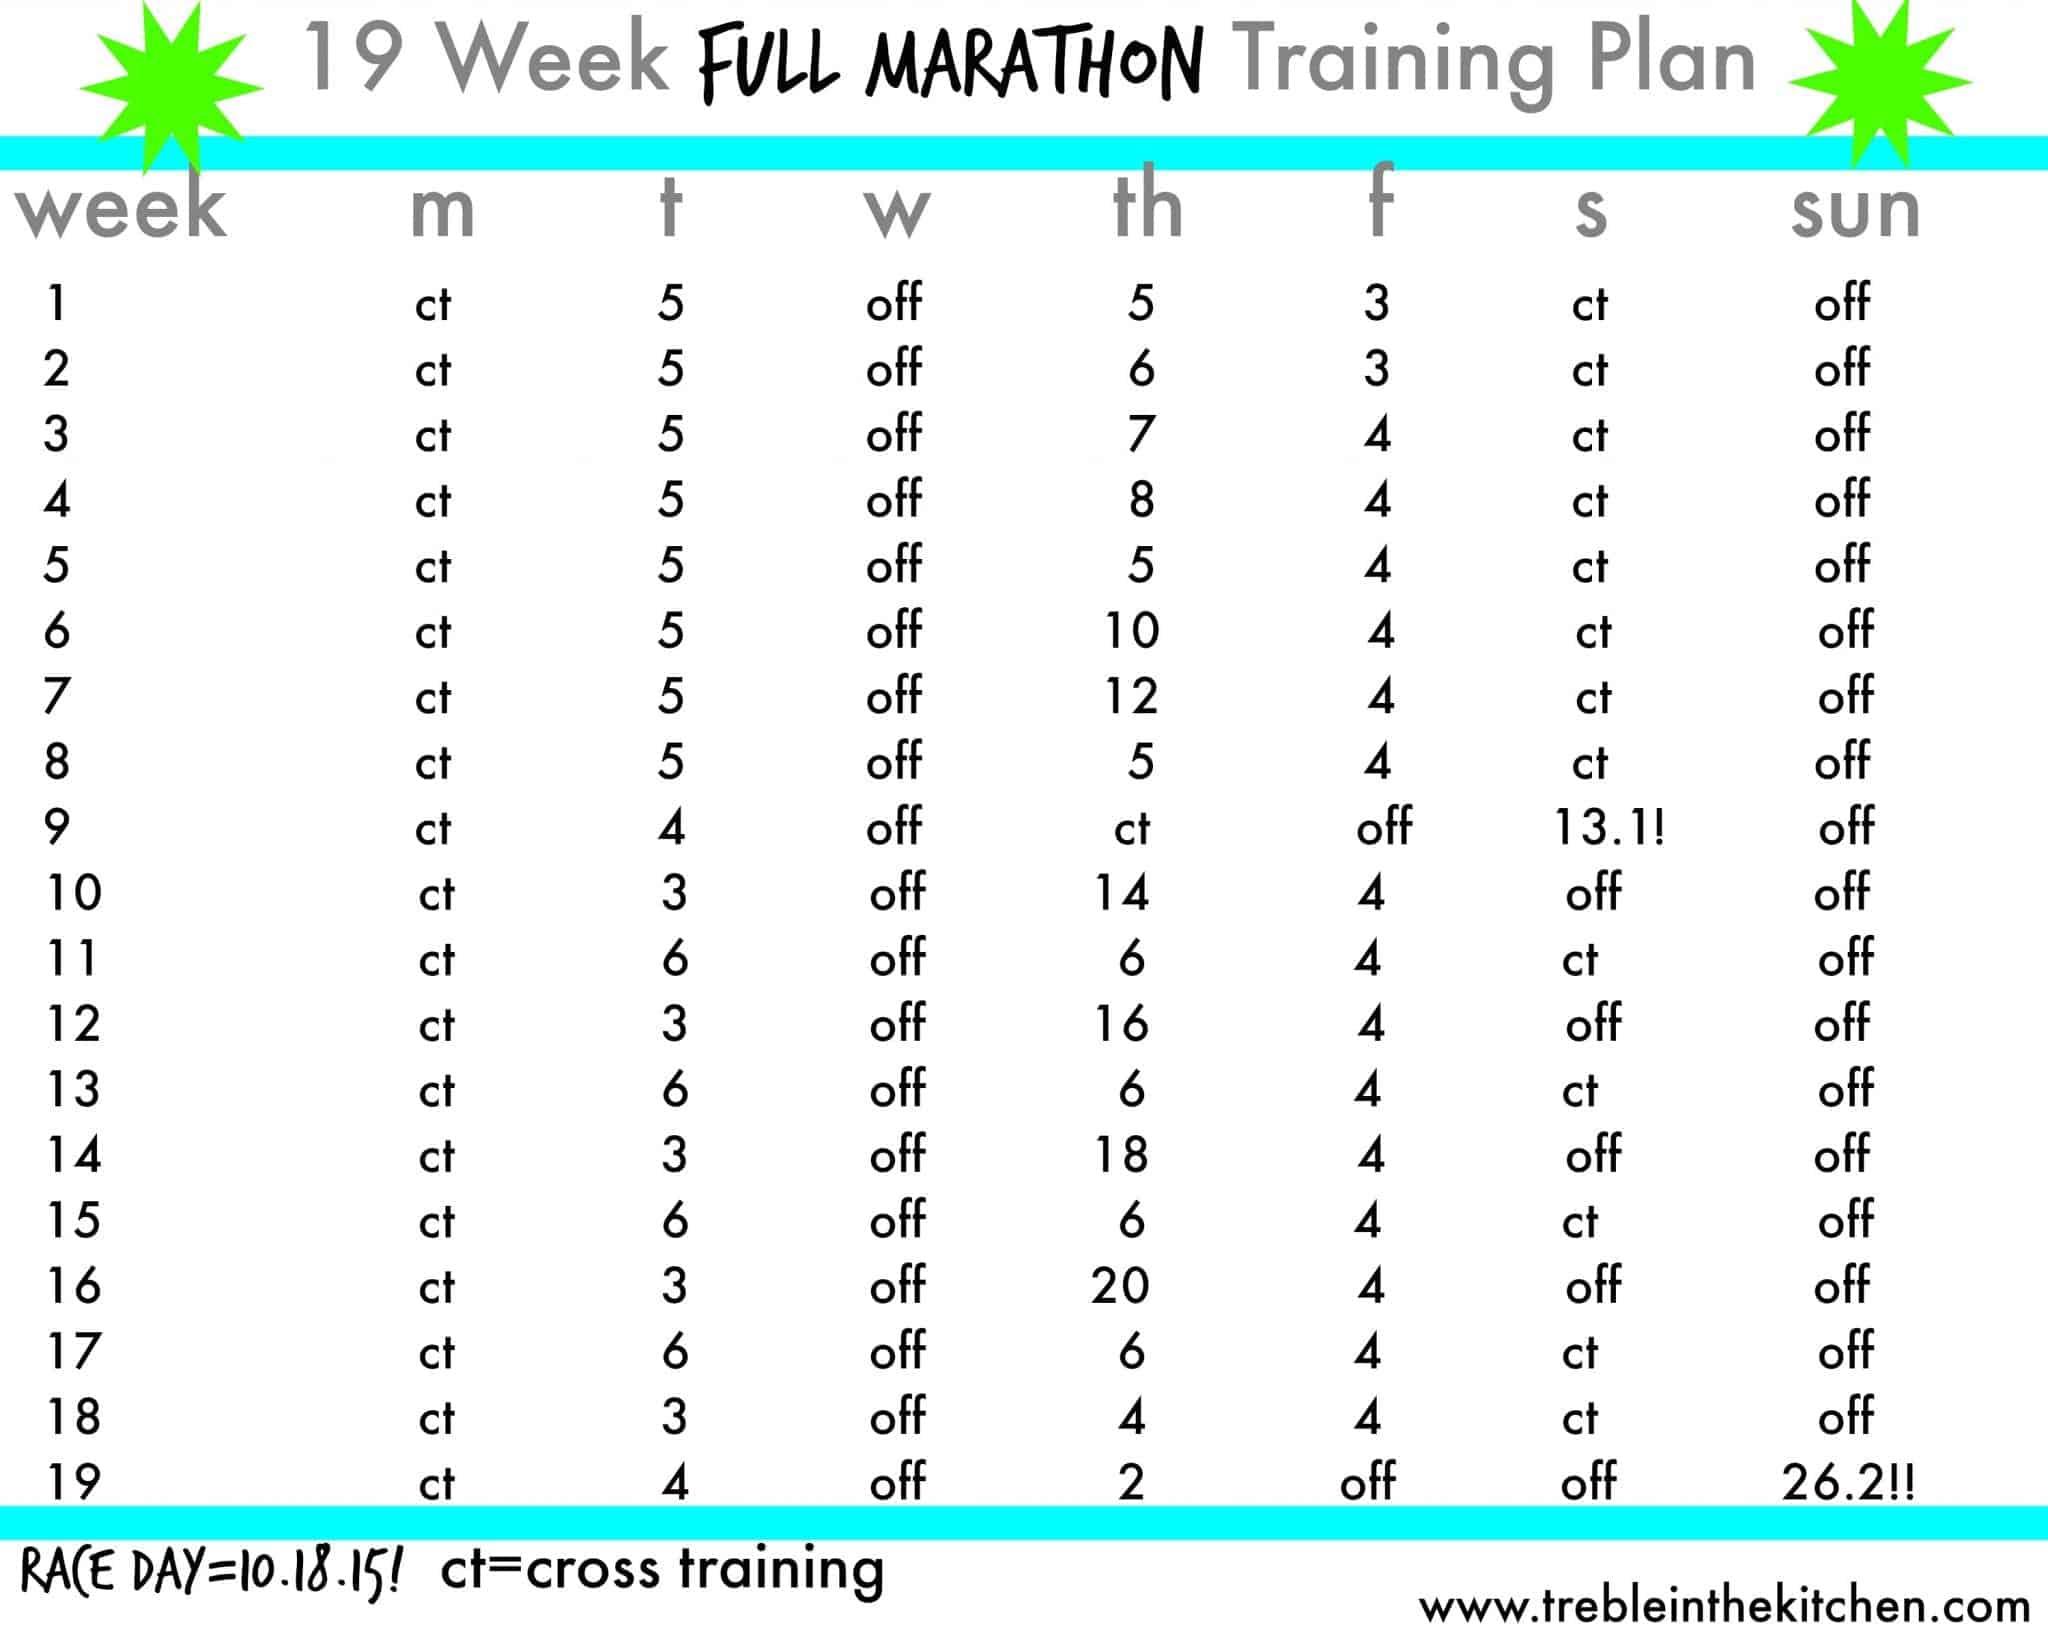 Full Marathon Training Plan via Treble in the Kitchen